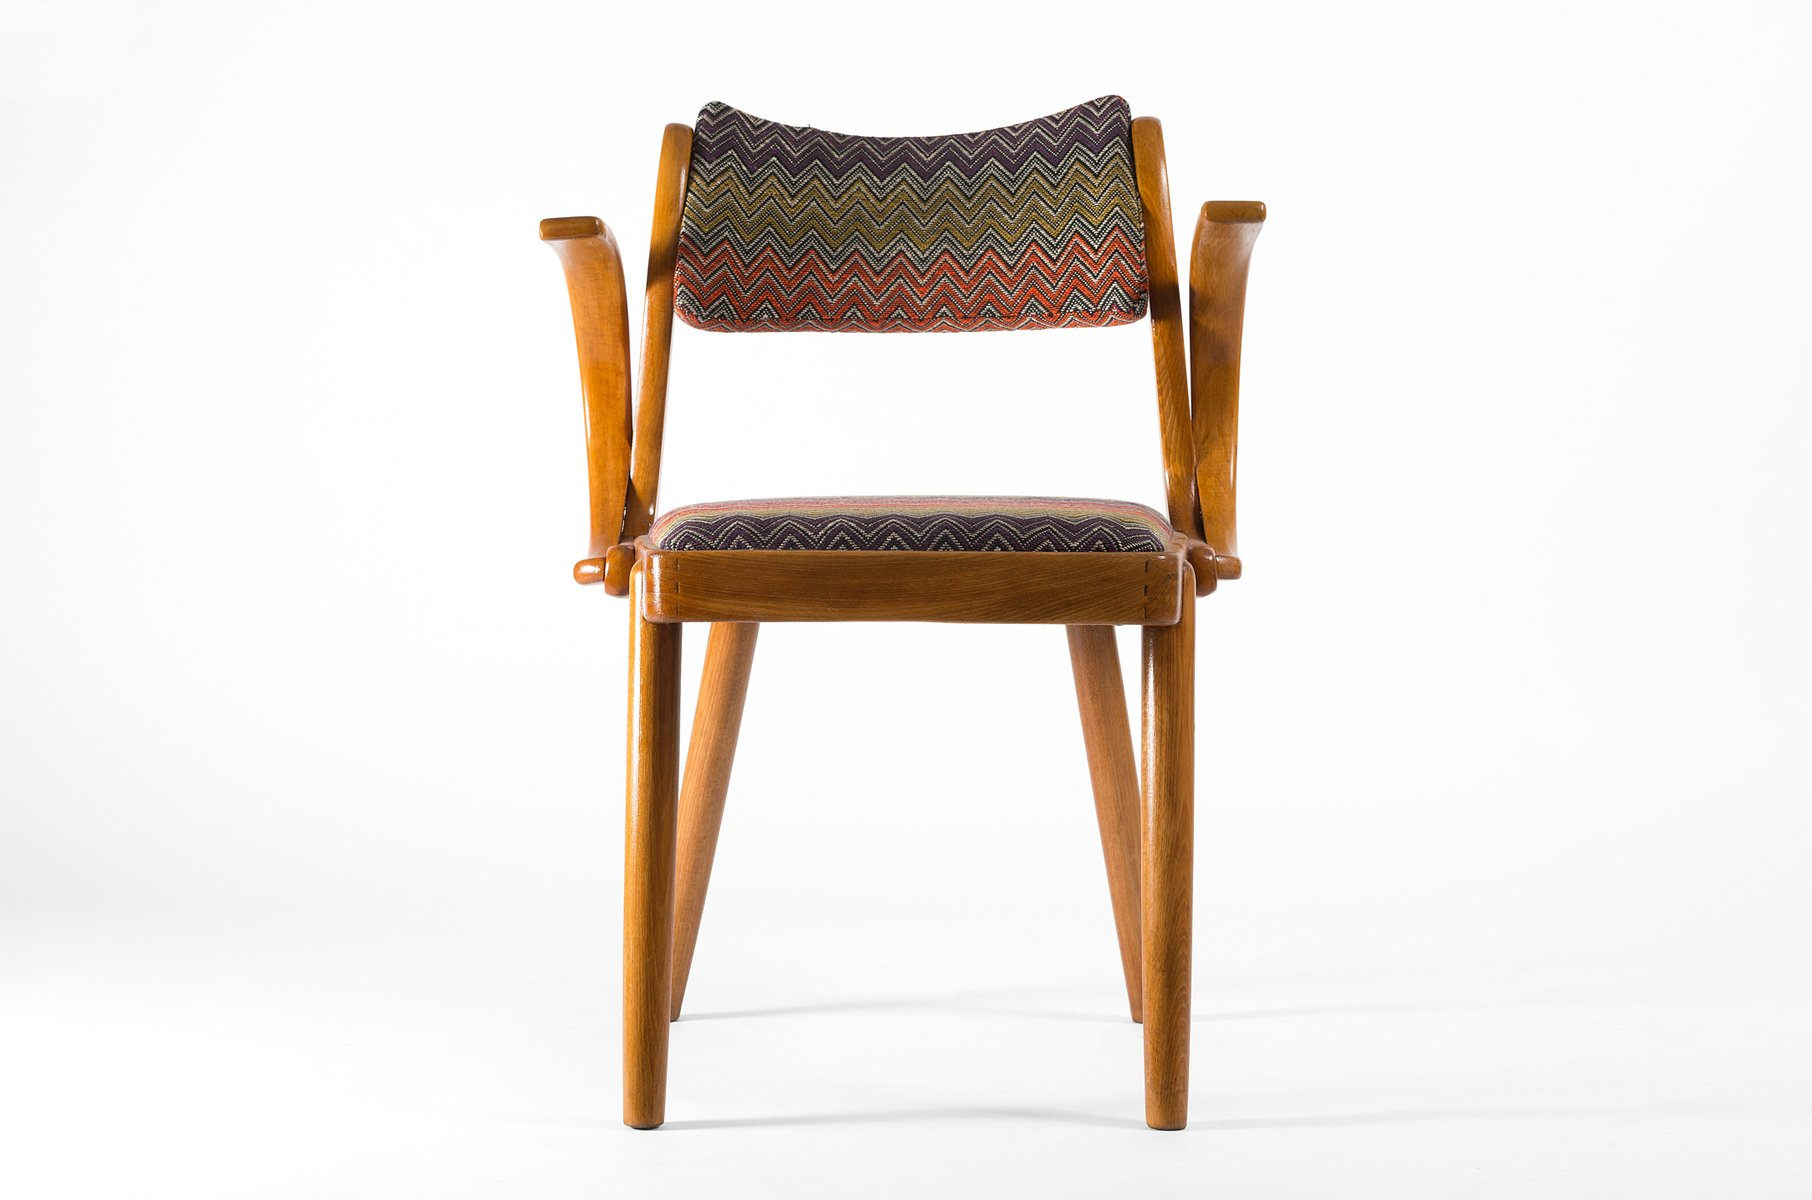 zickzack muster art deco armlehnstuhl 1930er bei pamono. Black Bedroom Furniture Sets. Home Design Ideas